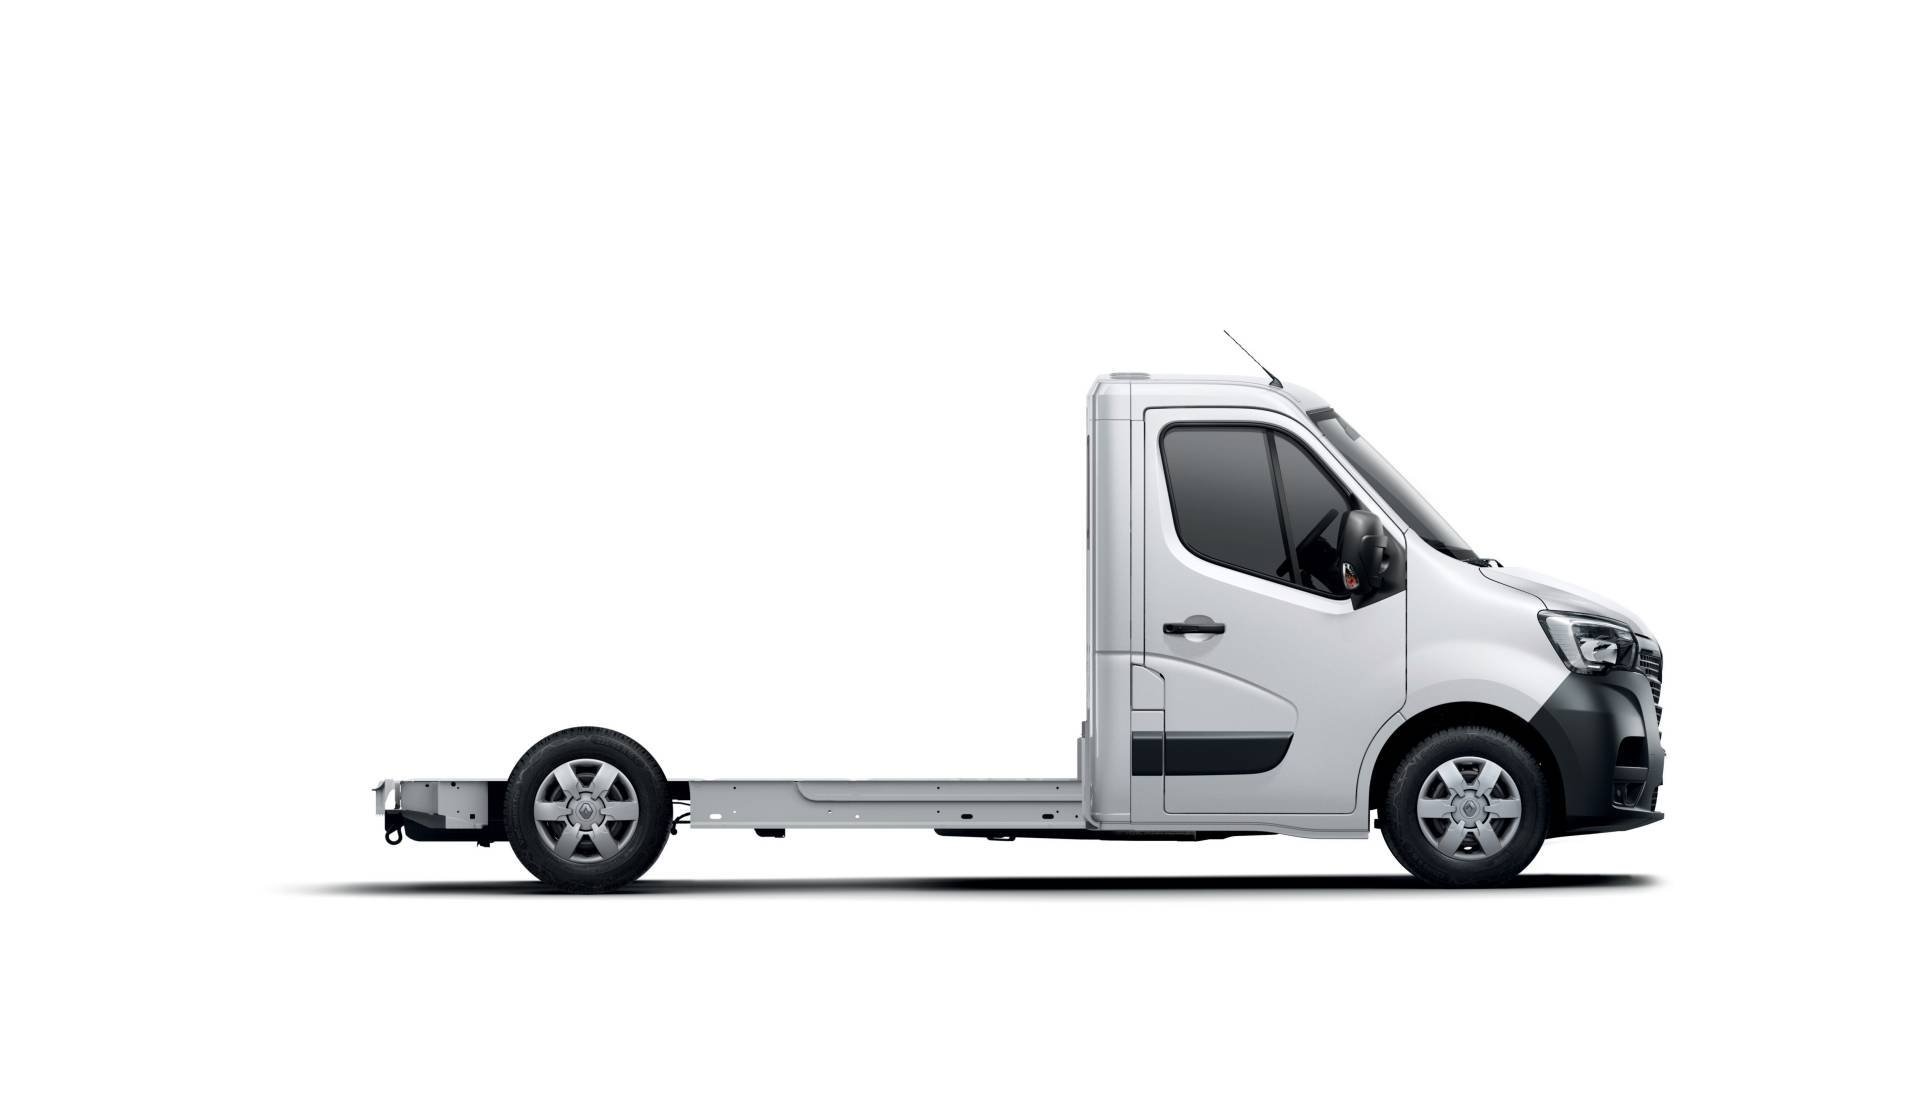 cab571b4-2019my-renault-master-van-facelift-11